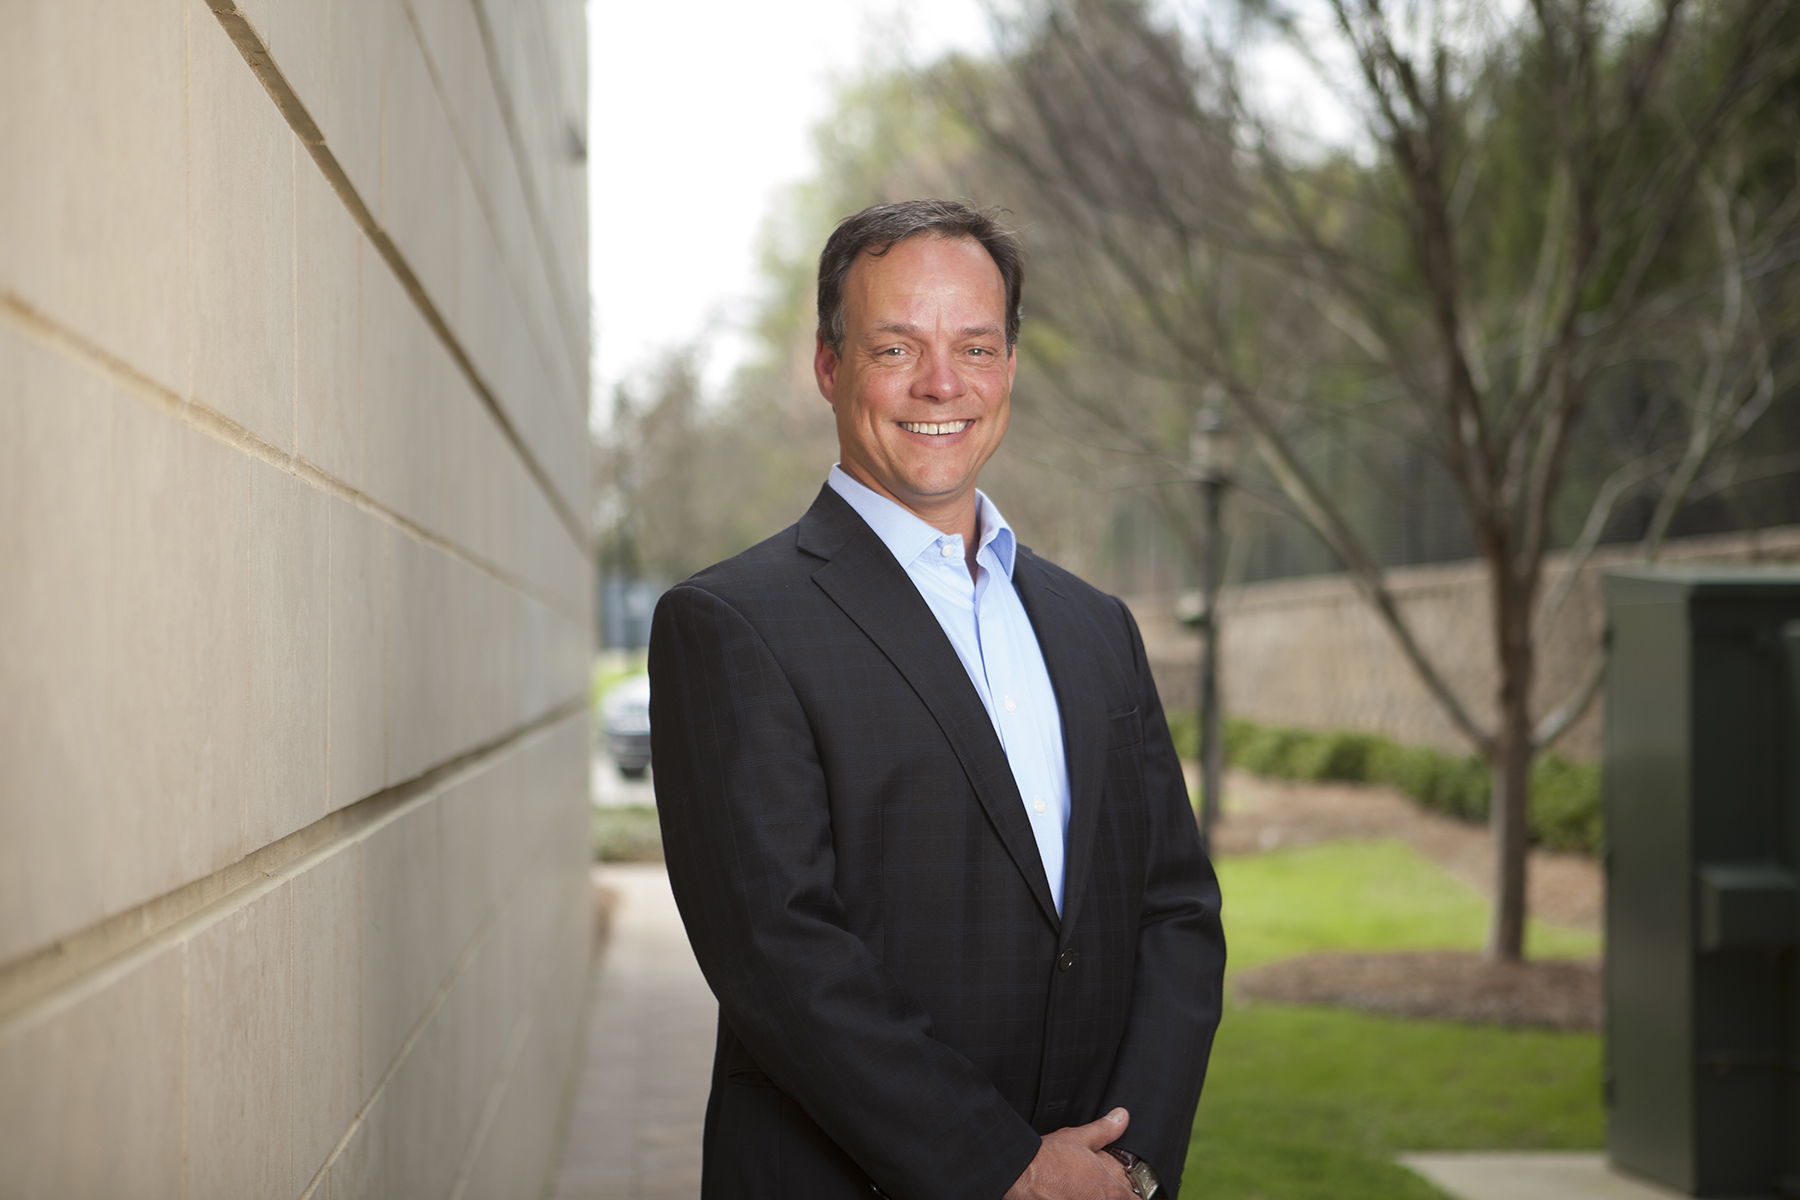 Rob Motley, Regional President of Insurance Office of America